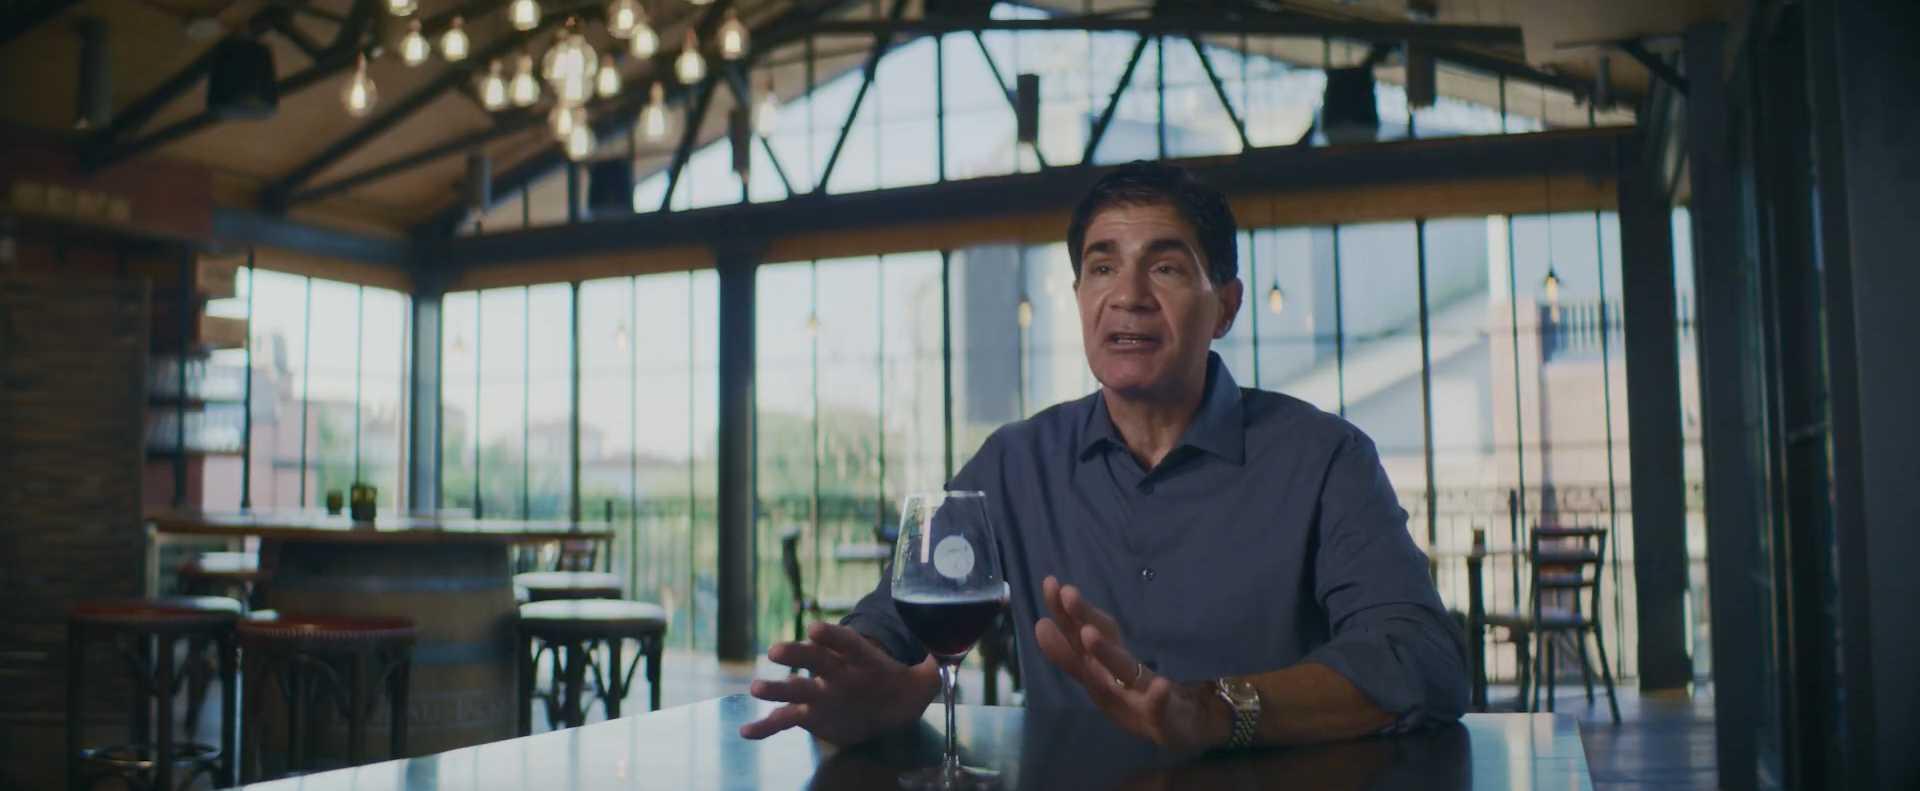 VID Wine Bar George Coravin Testimonial